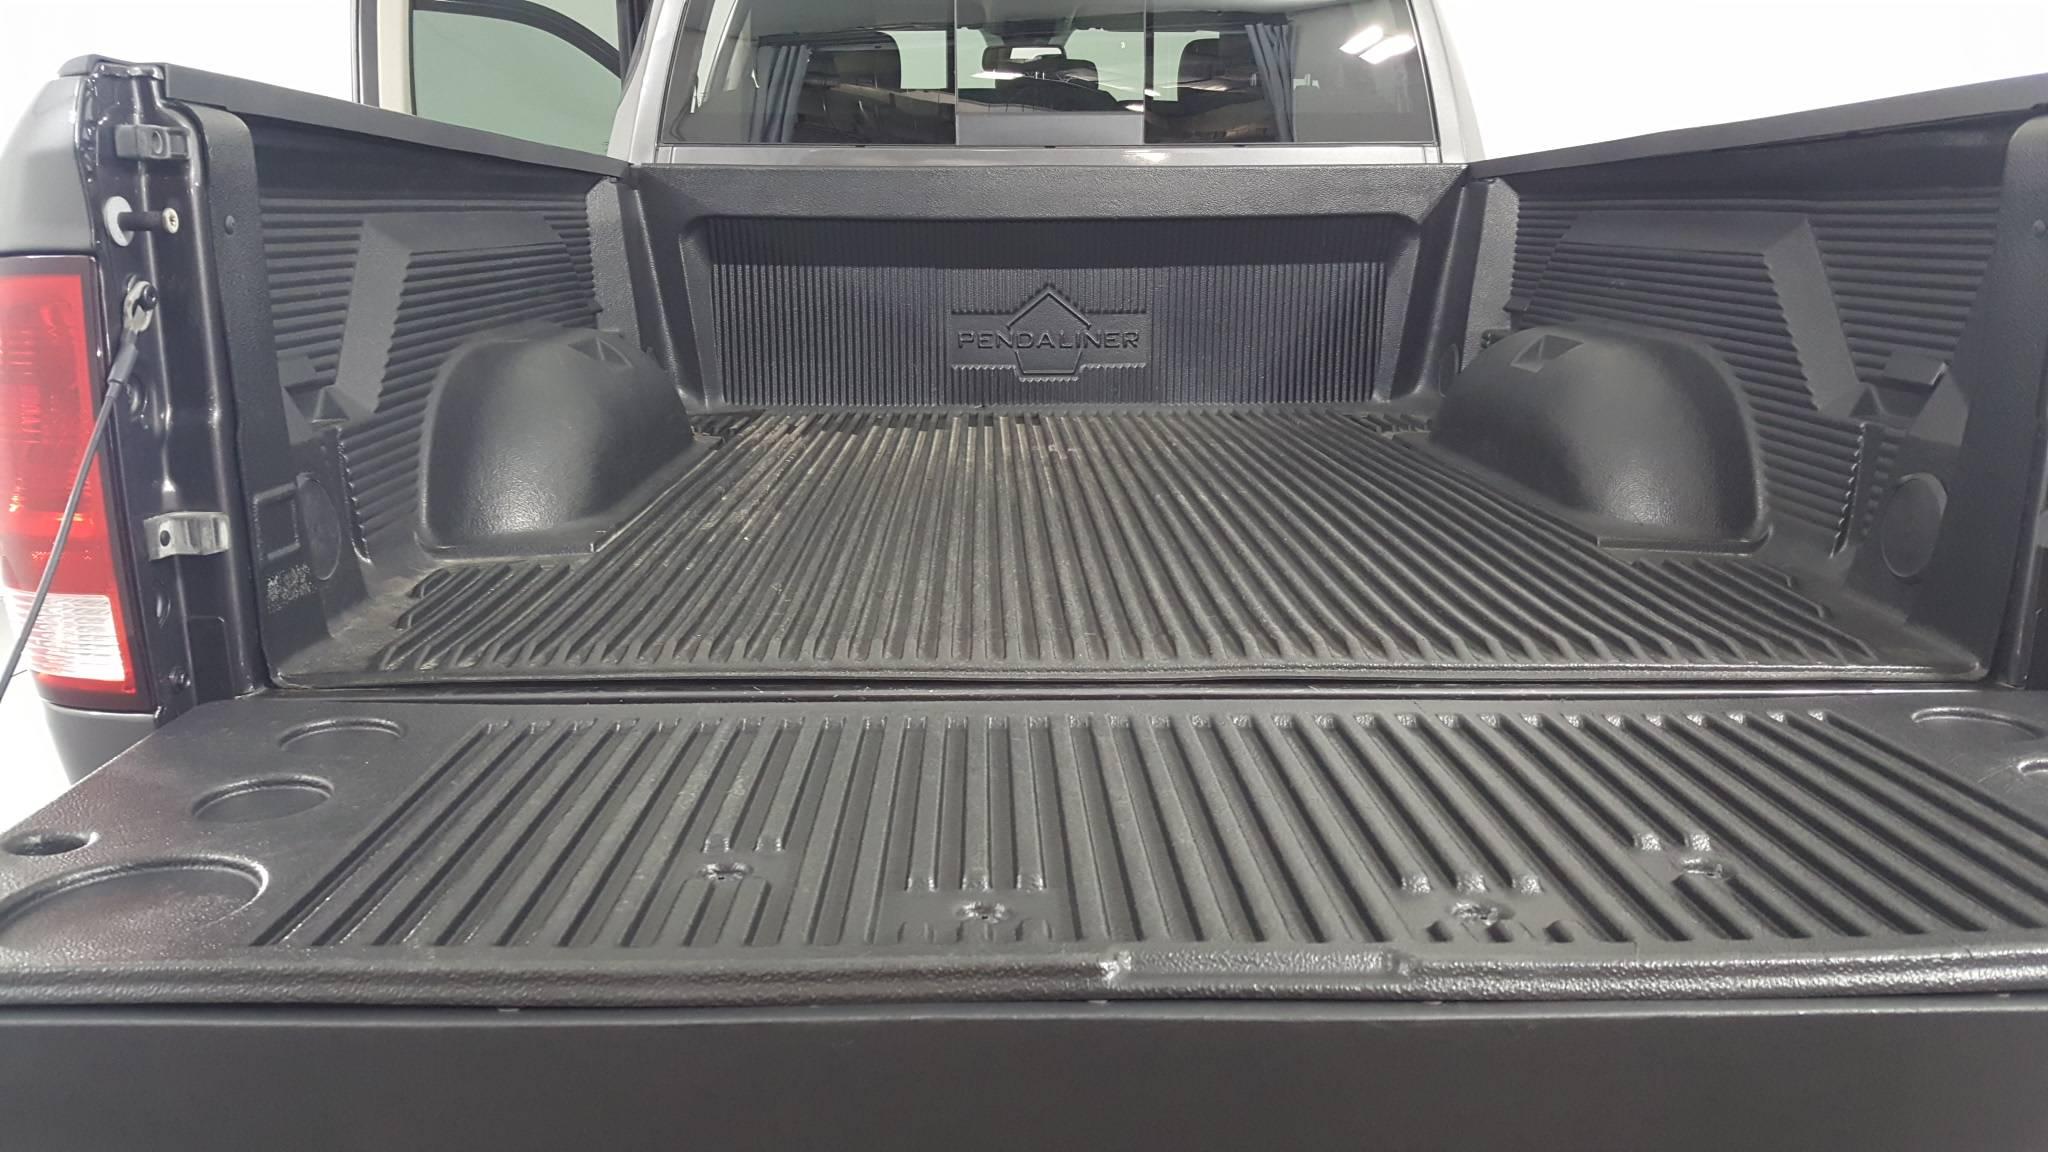 Pre-Owned 2016 Ram 1500 SLT